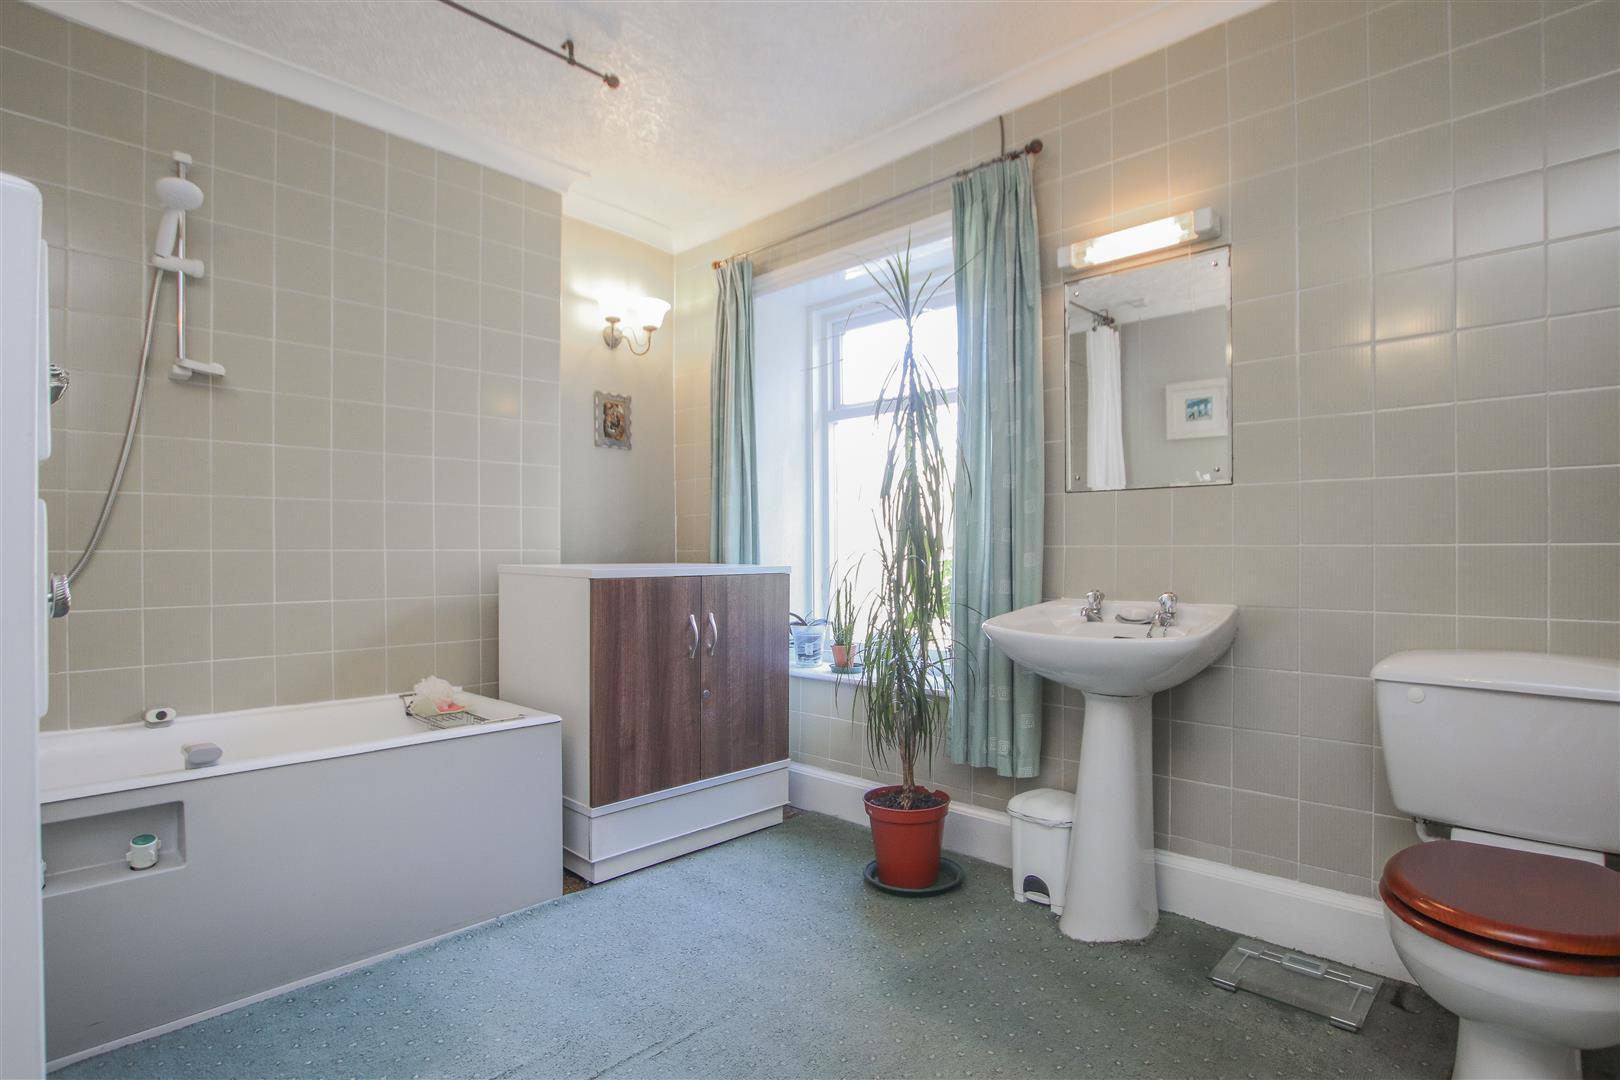 3 Bedroom Mid Terrace House For Sale - 21.JPG